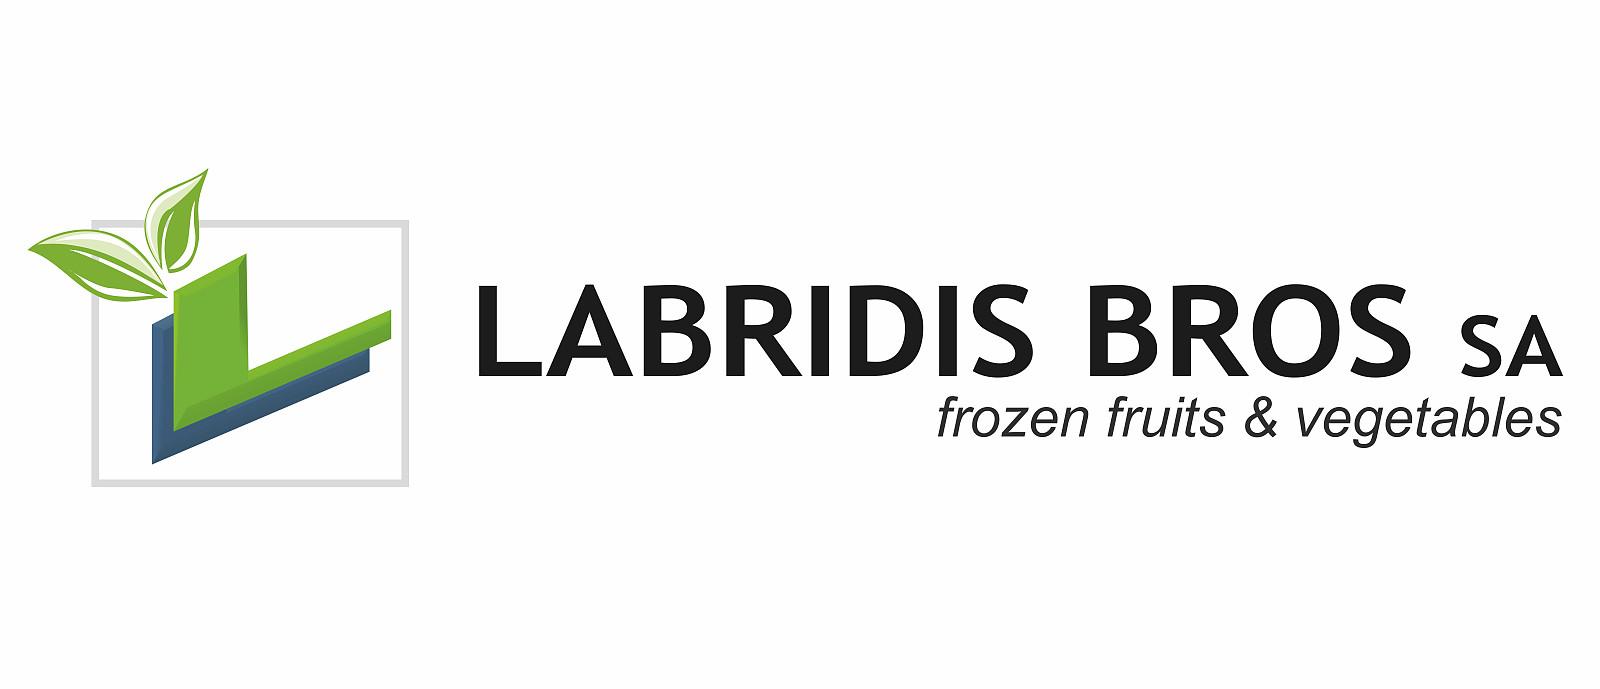 Labridis Bros Logo.jpg [1.18 MB]